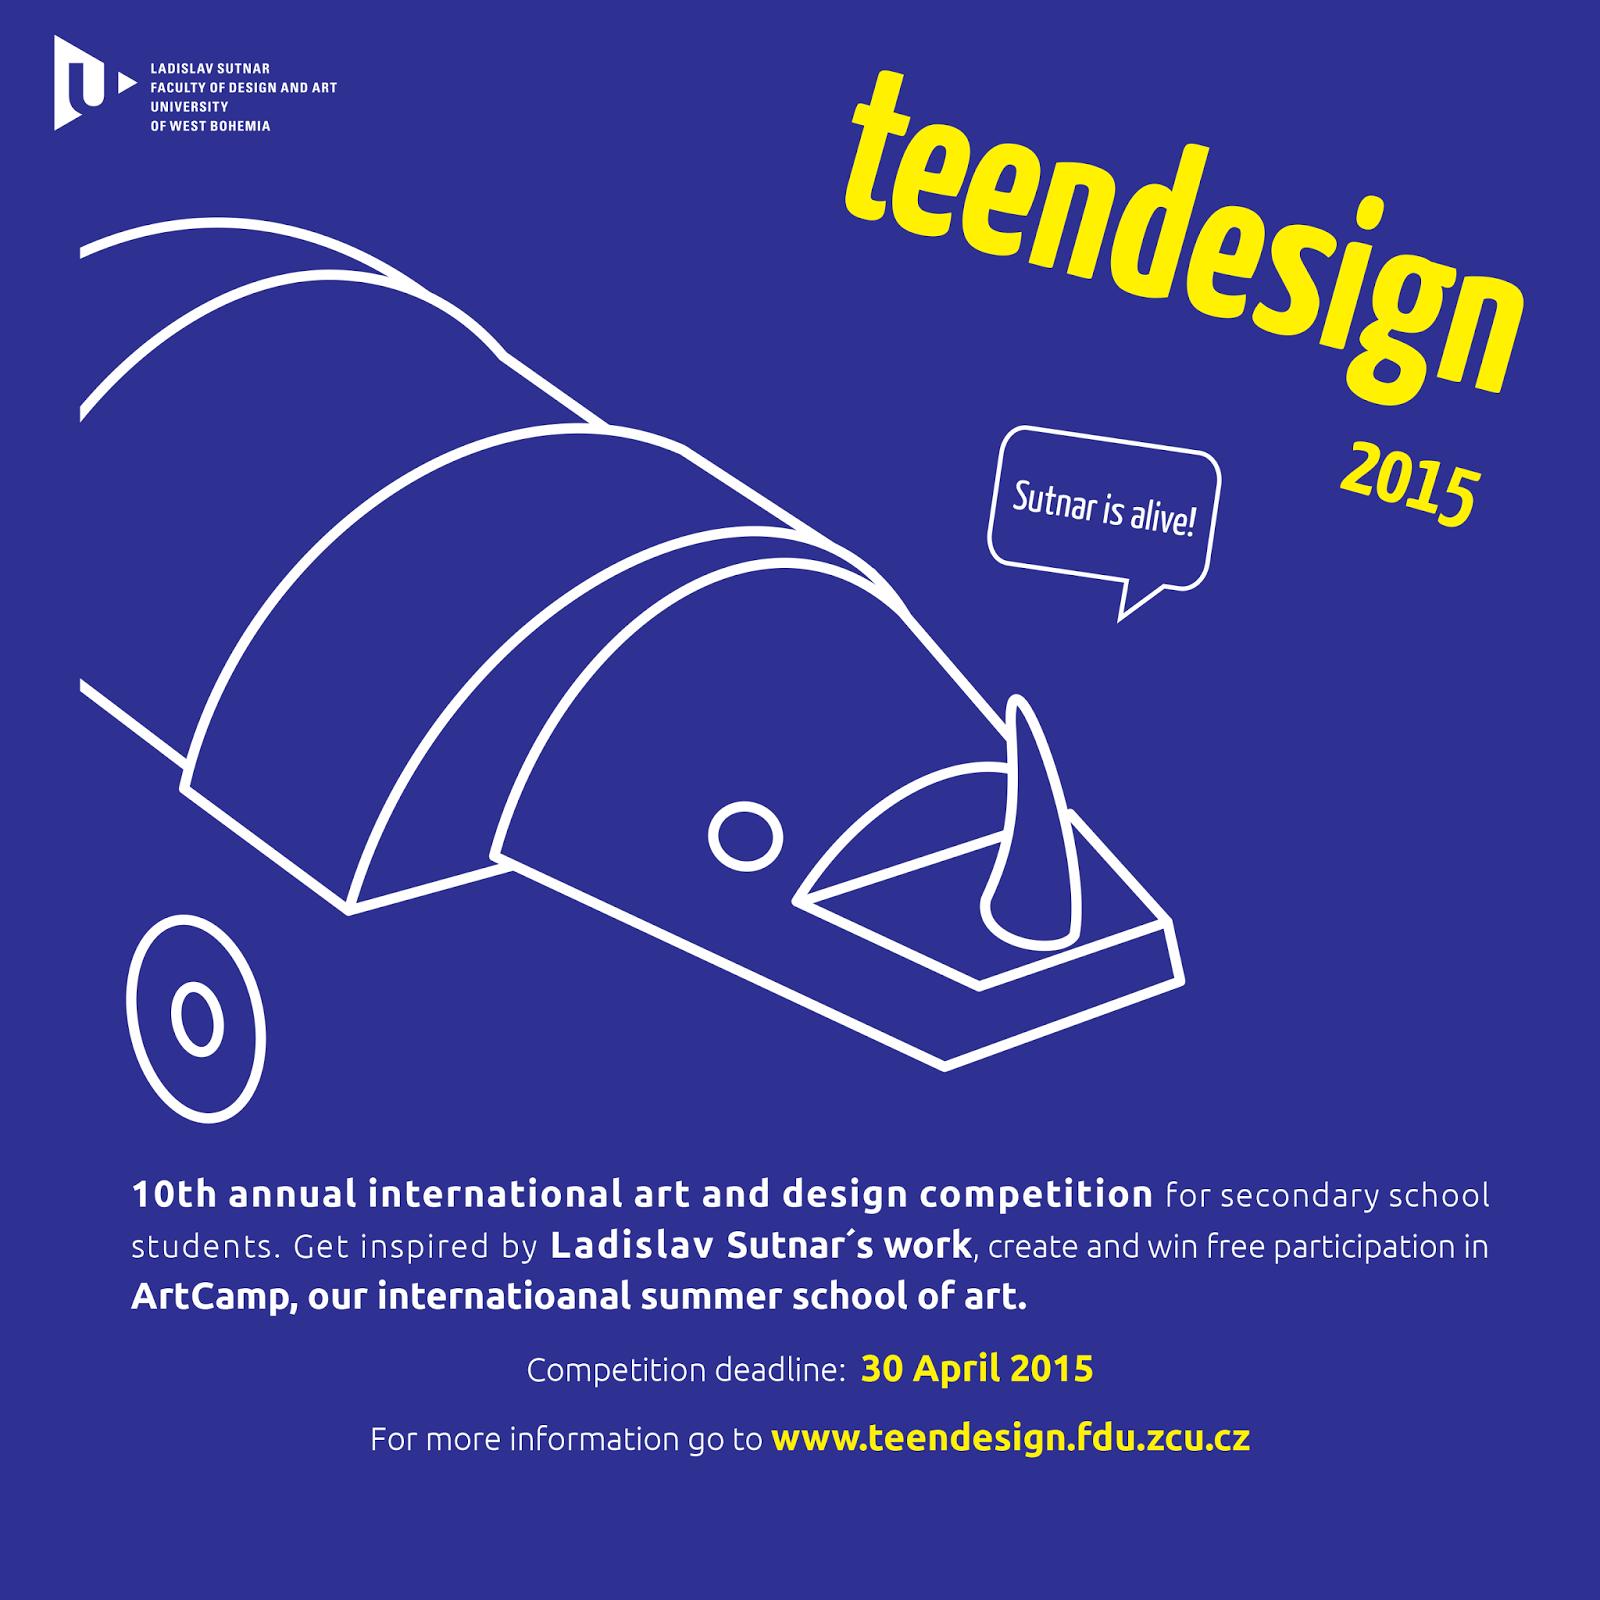 Teendesign 2015